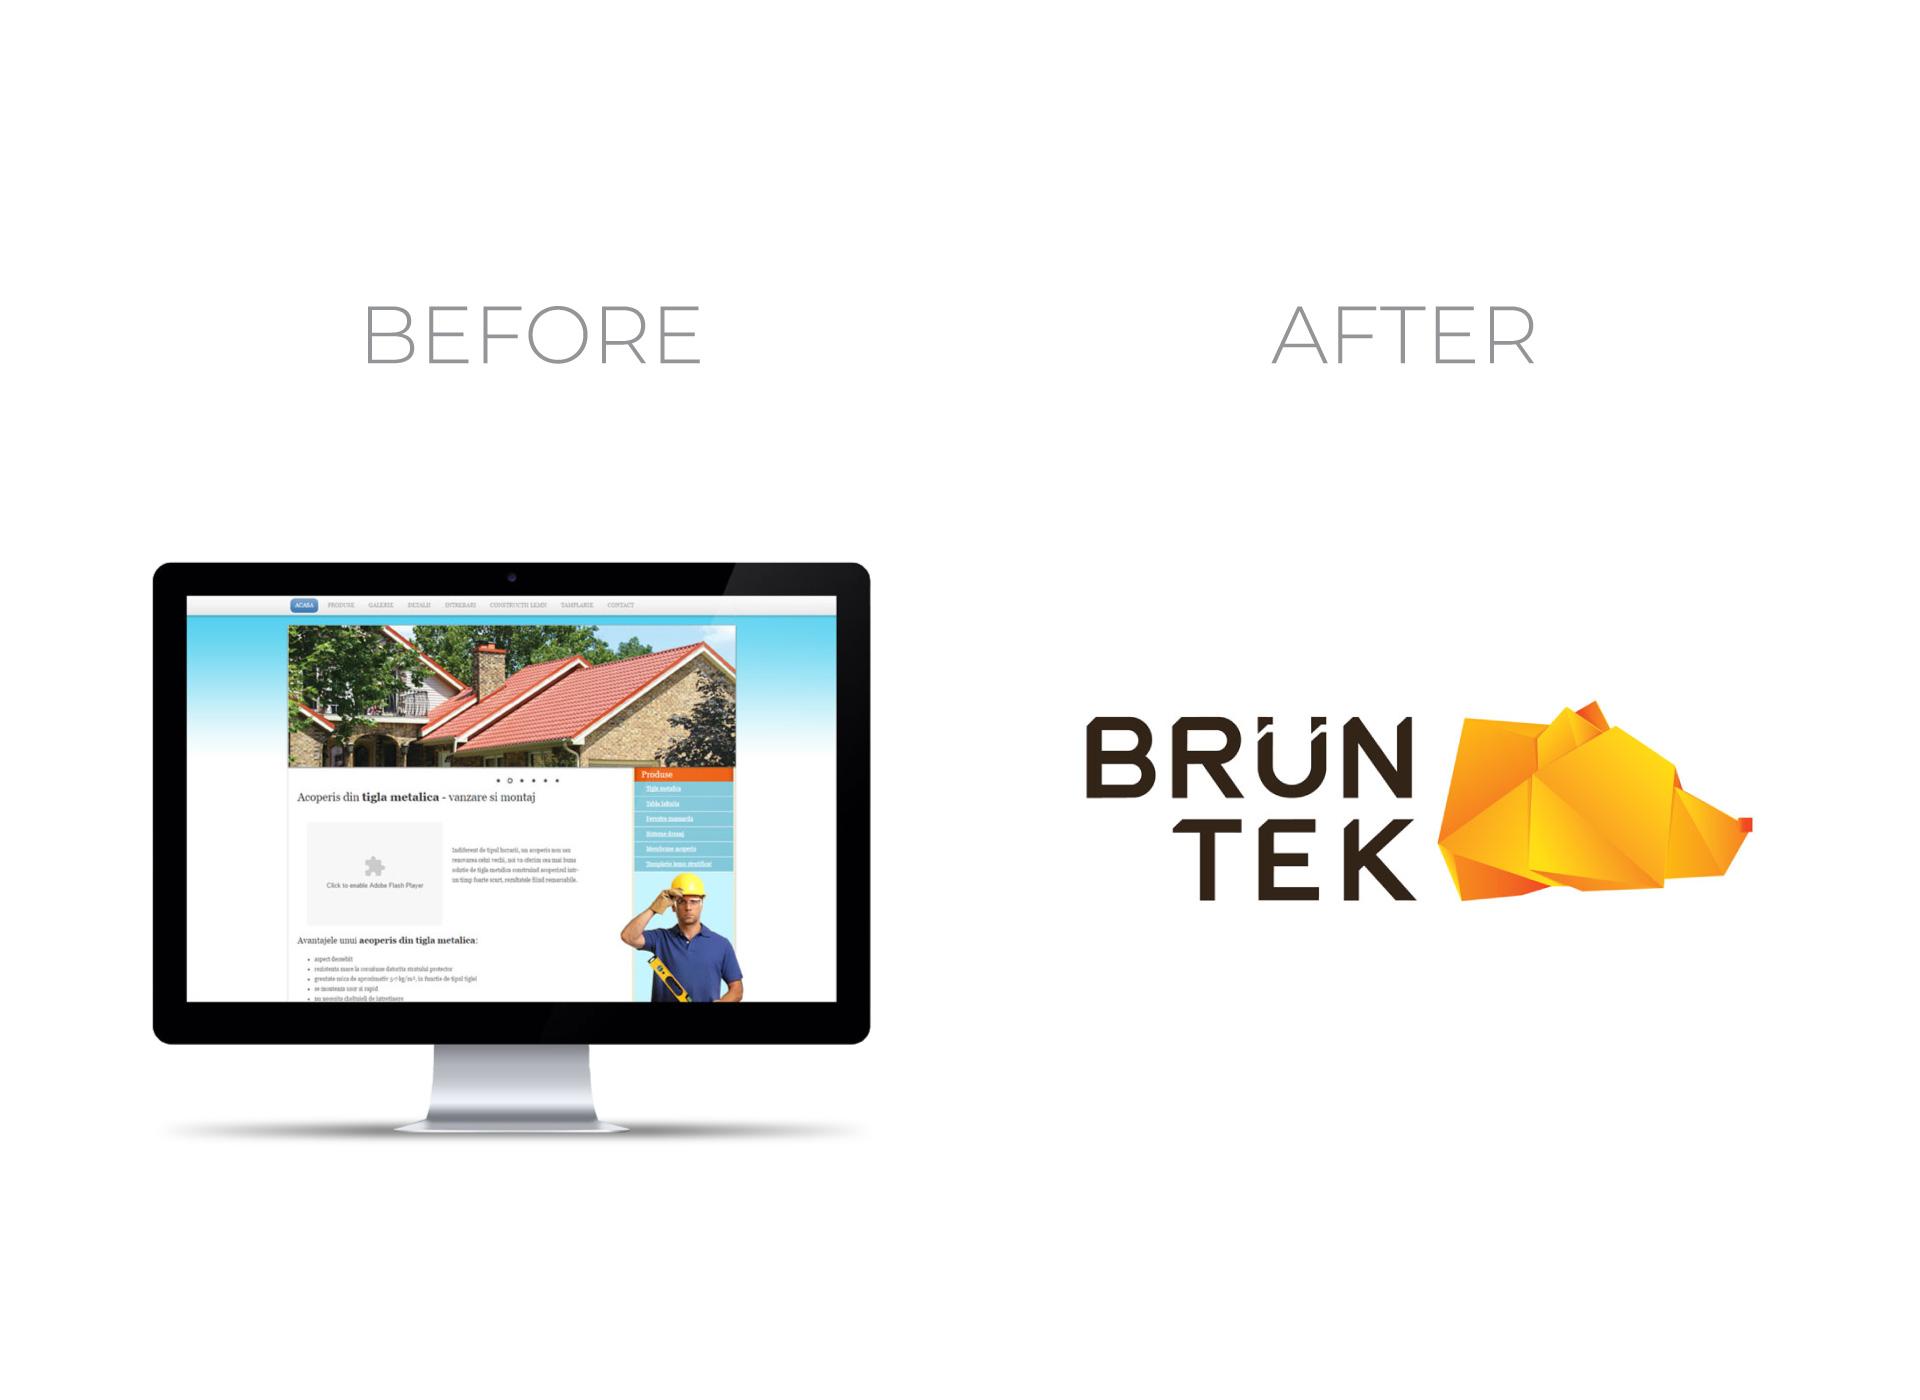 bruntek portfolio inoveo before and after rebranding